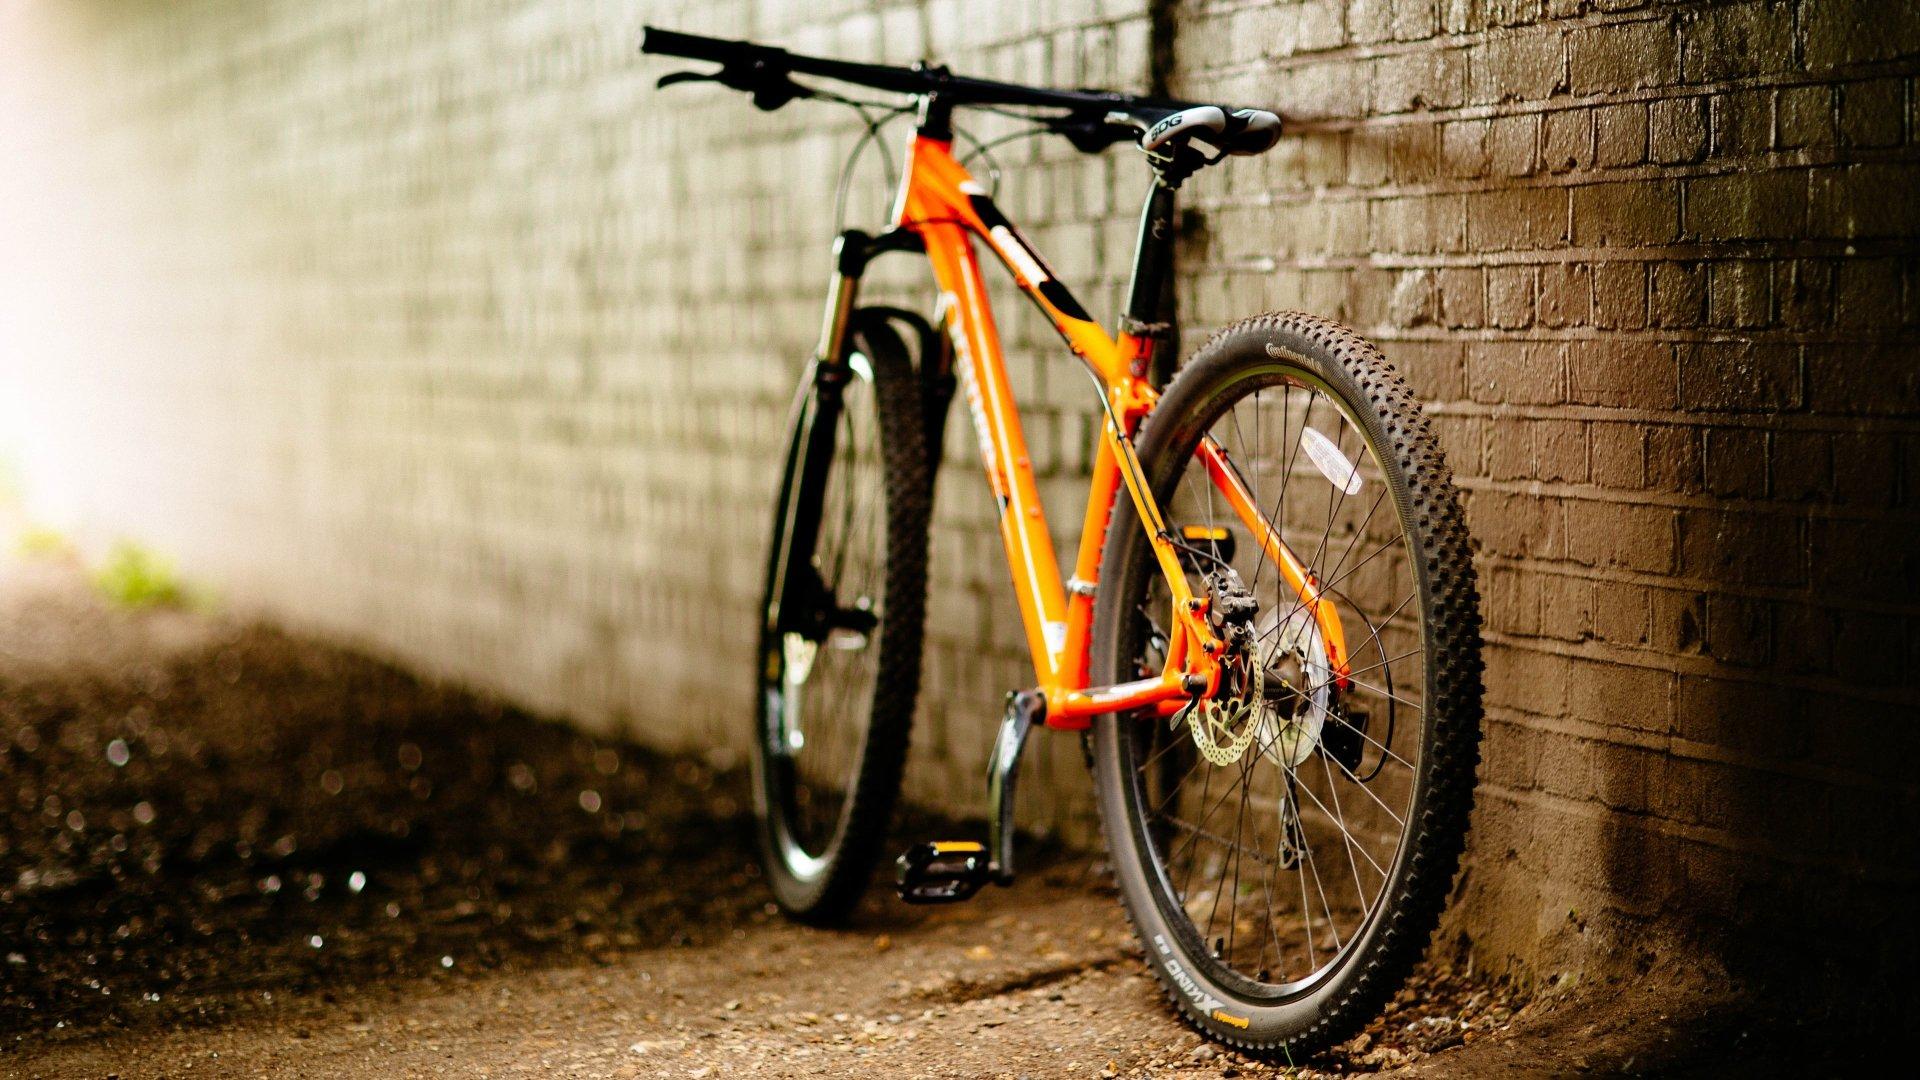 Fabricante de bicicletas